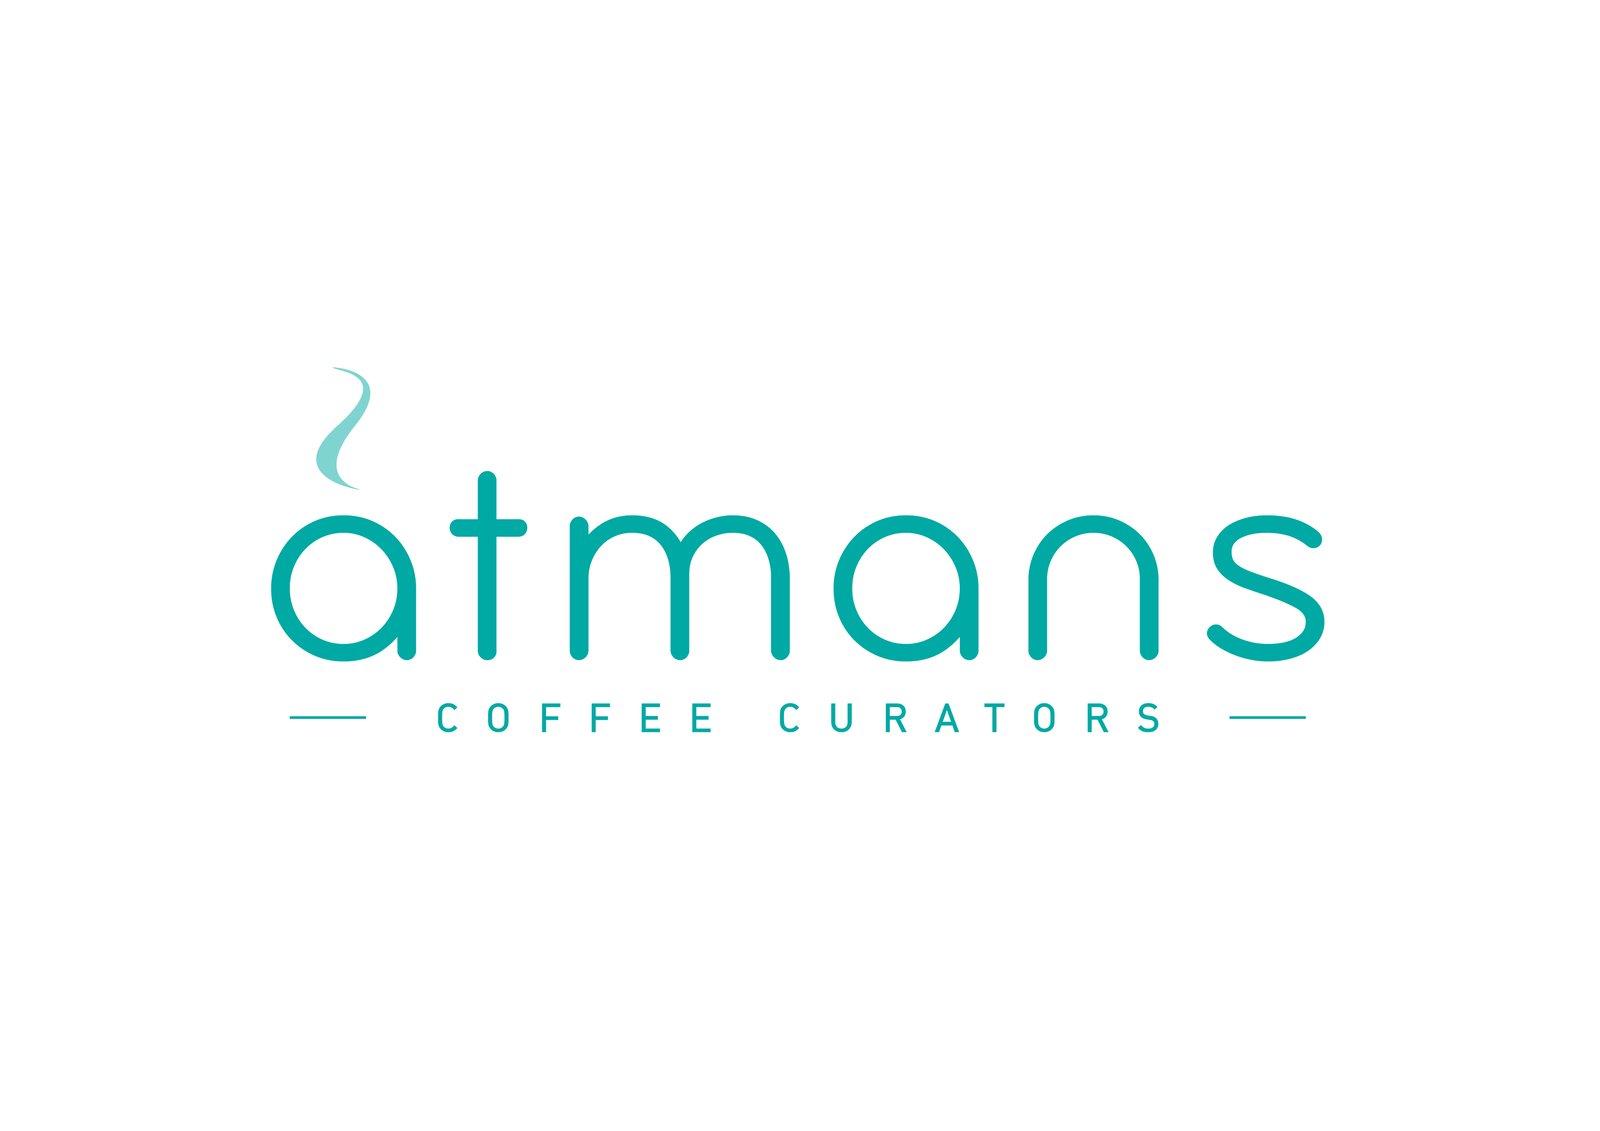 atmanscoffee